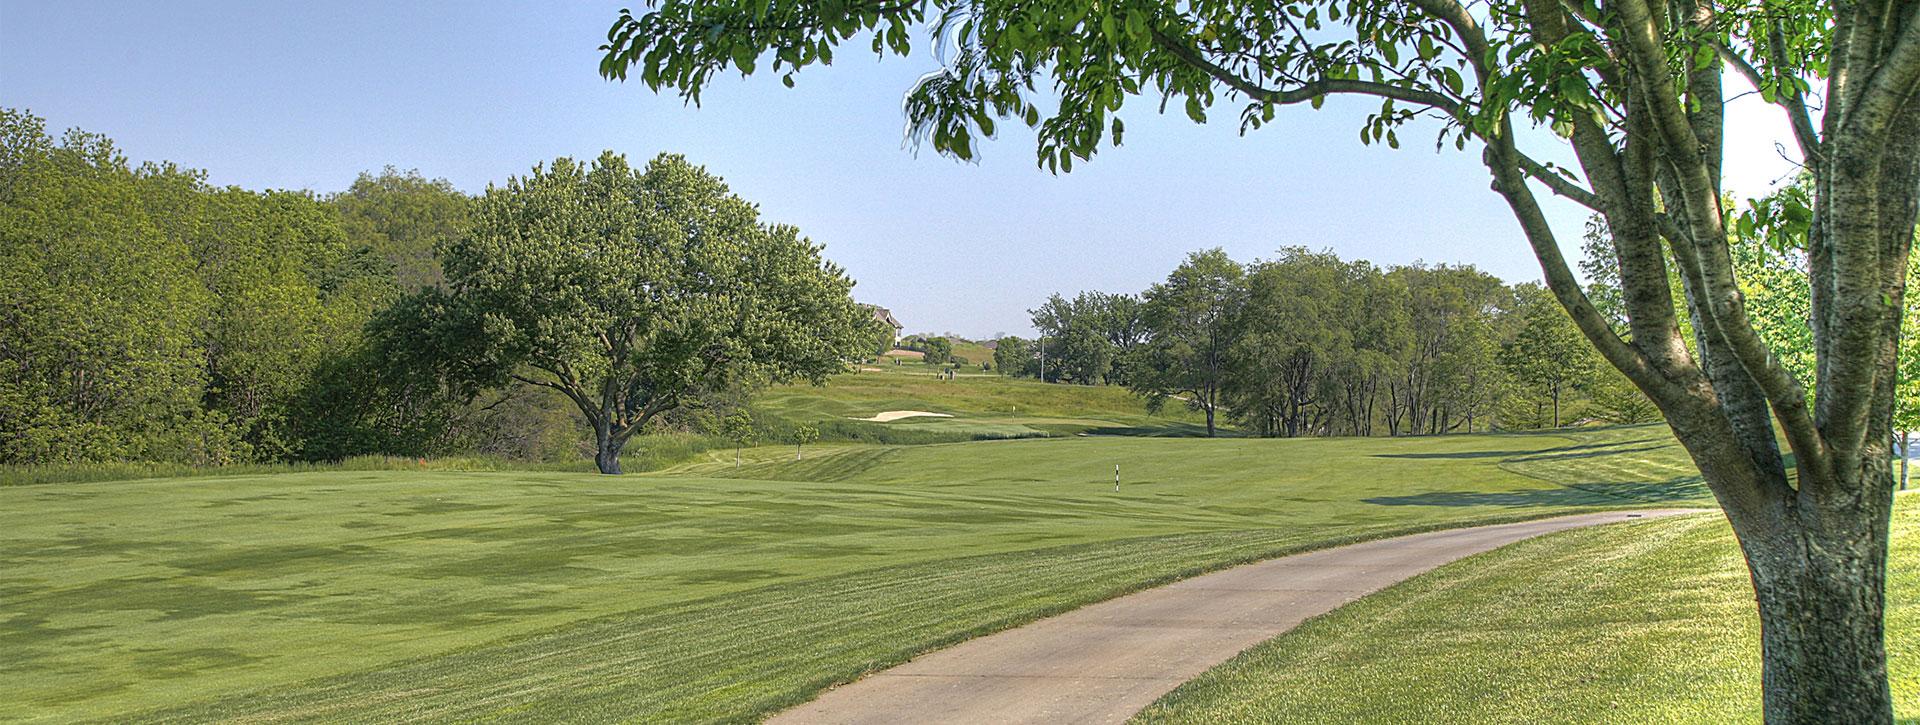 The Players Club at Deer Creek